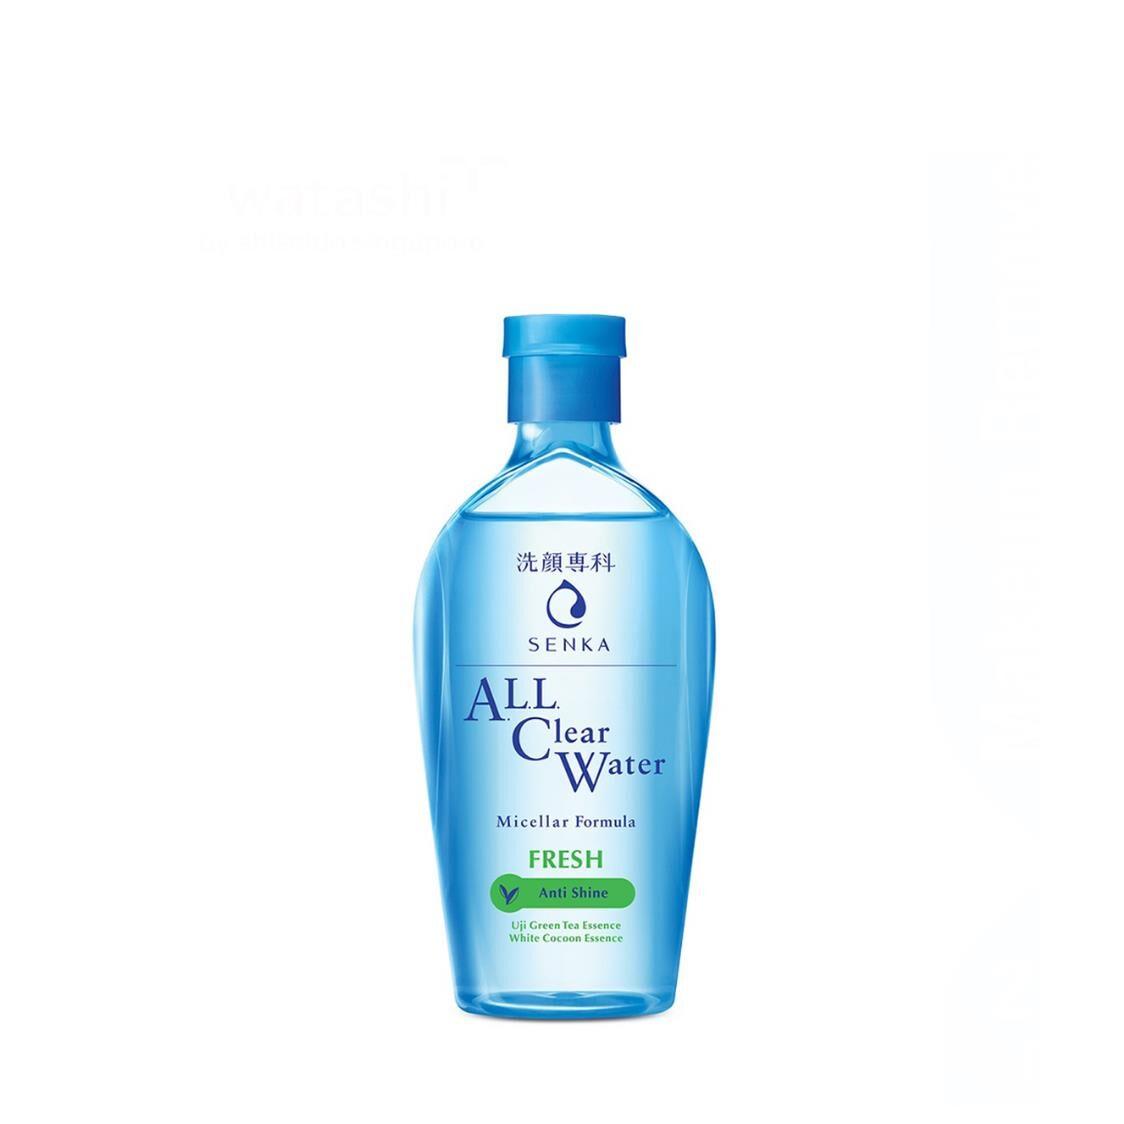 Senka All Clear Water Micellar Fresh 230ml